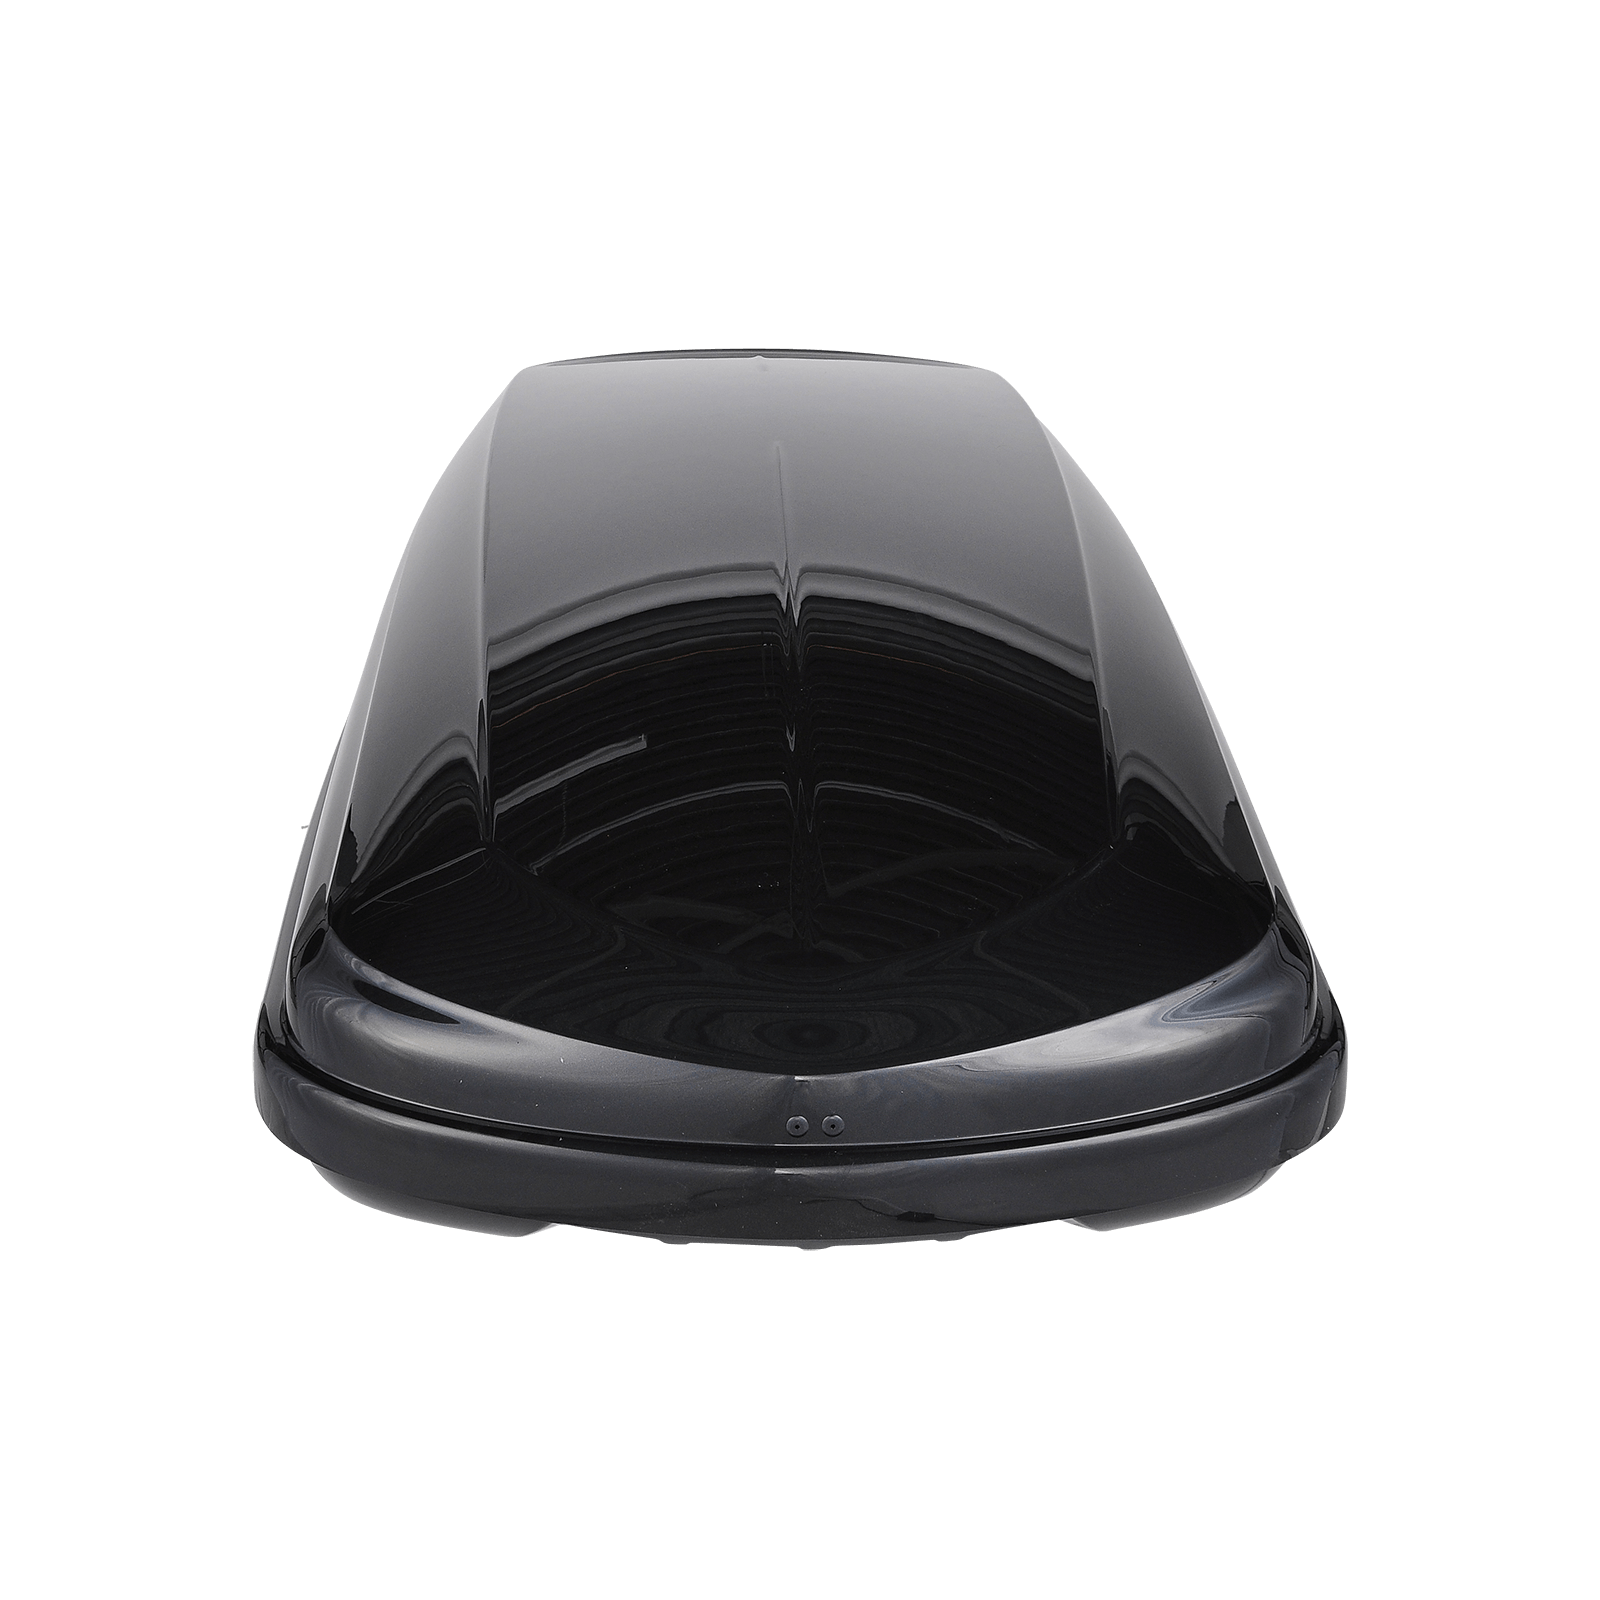 Dachbox Hapro Traxer 8.6 Brilliantblack - Bild 3